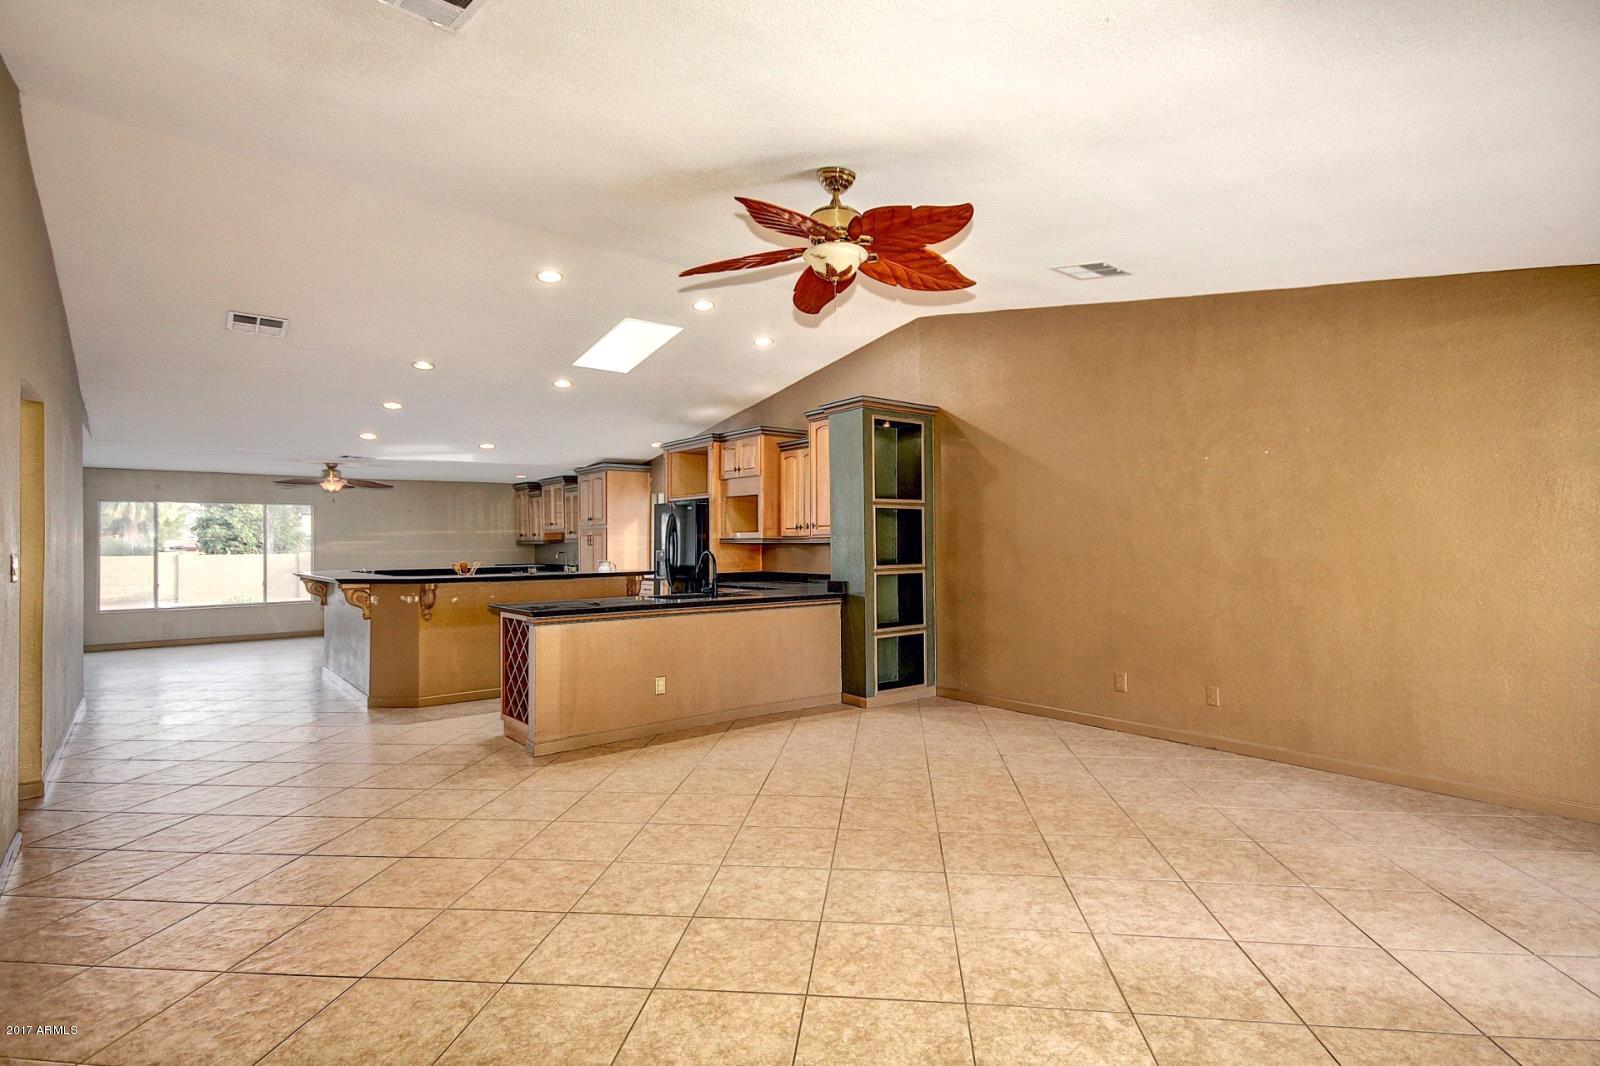 11828 S HALF MOON Drive Phoenix, AZ 85044 - MLS #: 5693909